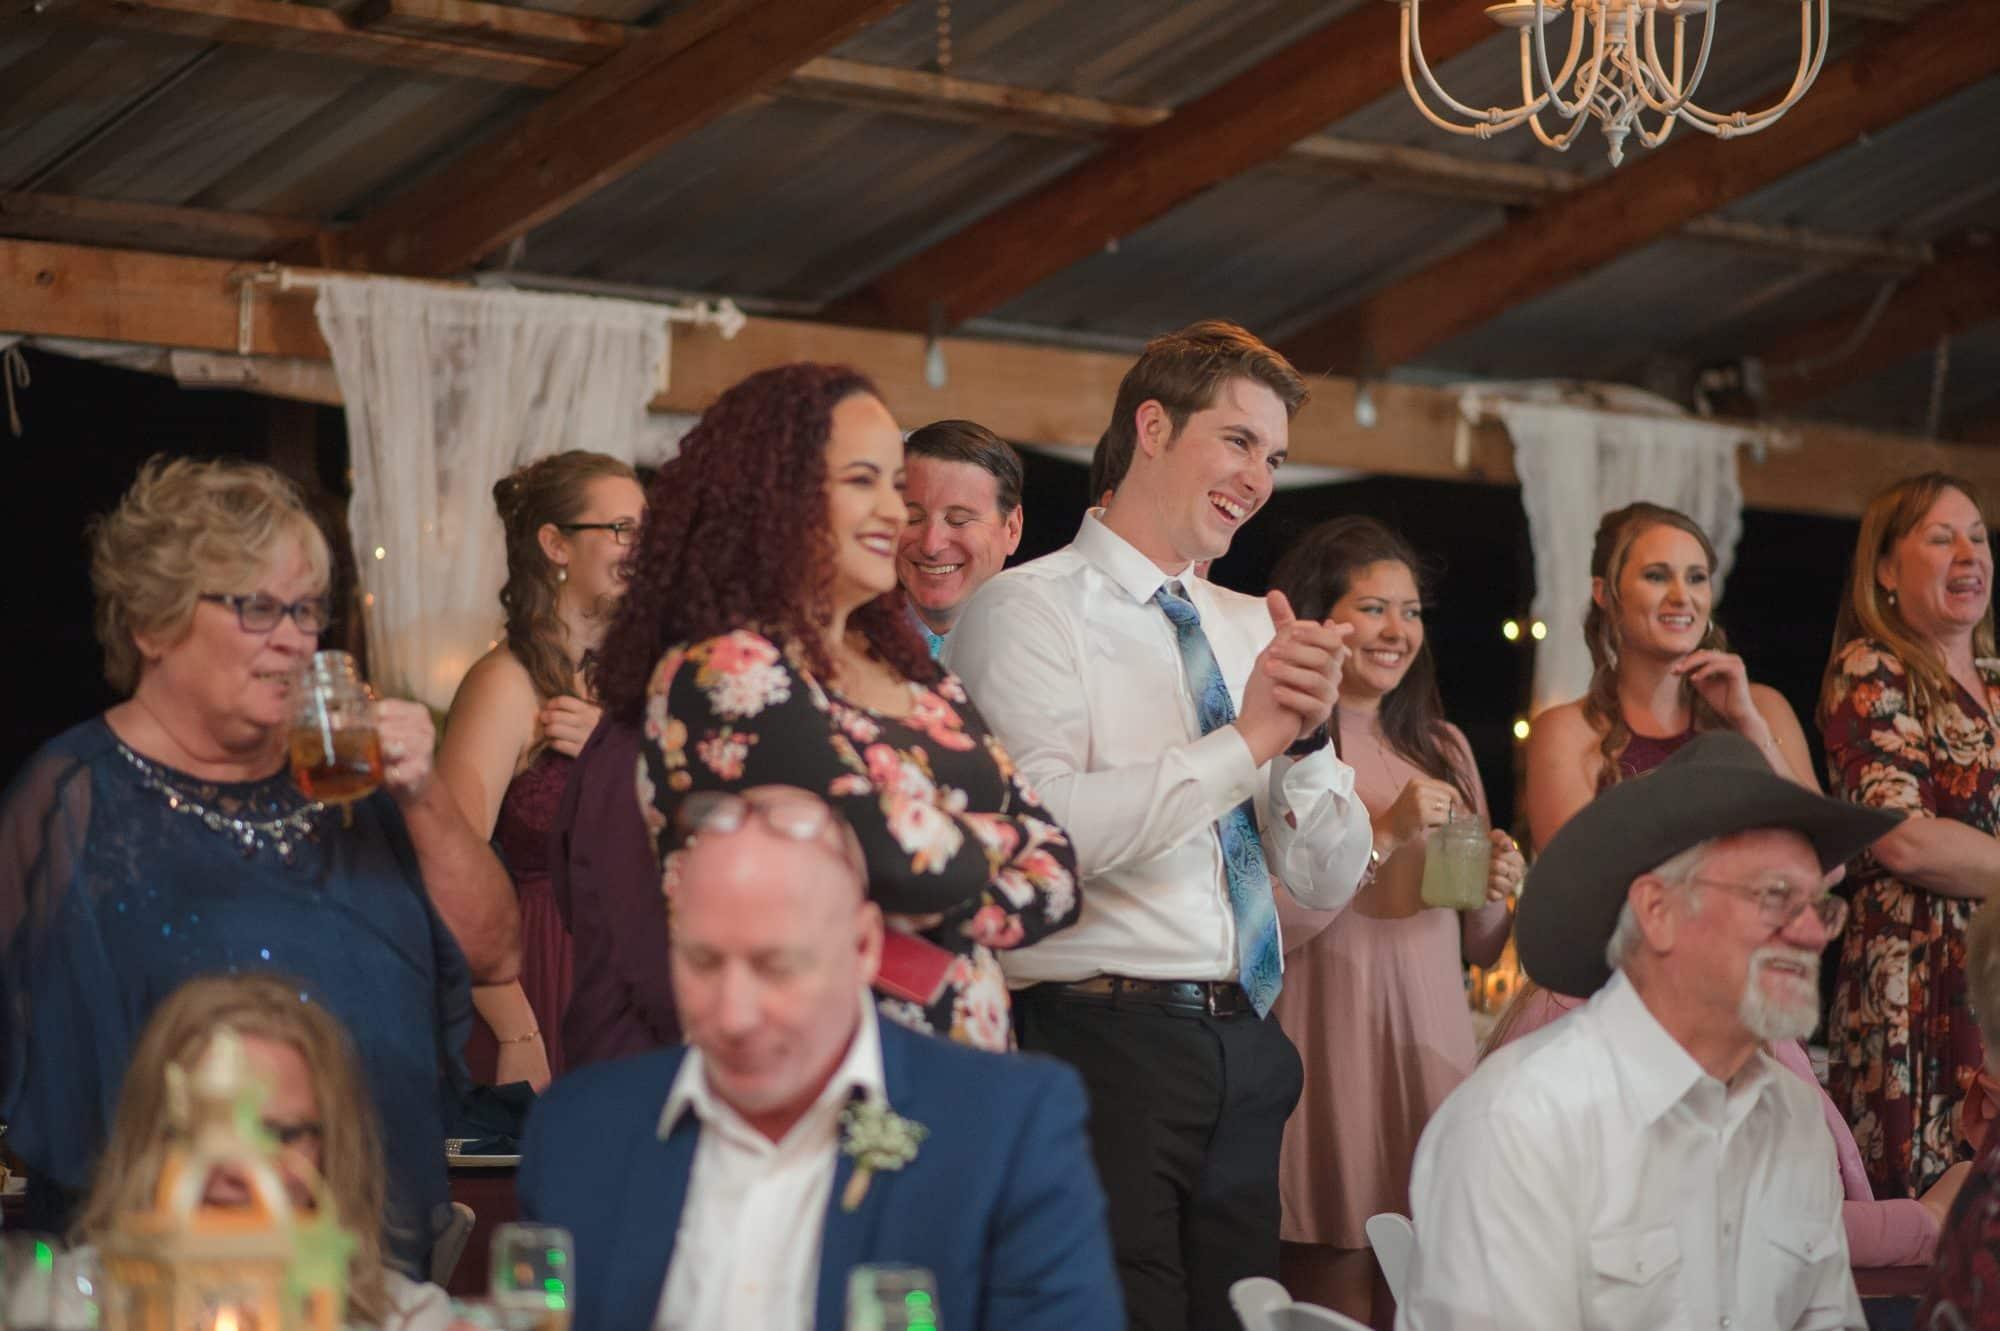 wedding guests smiling at dance floor.